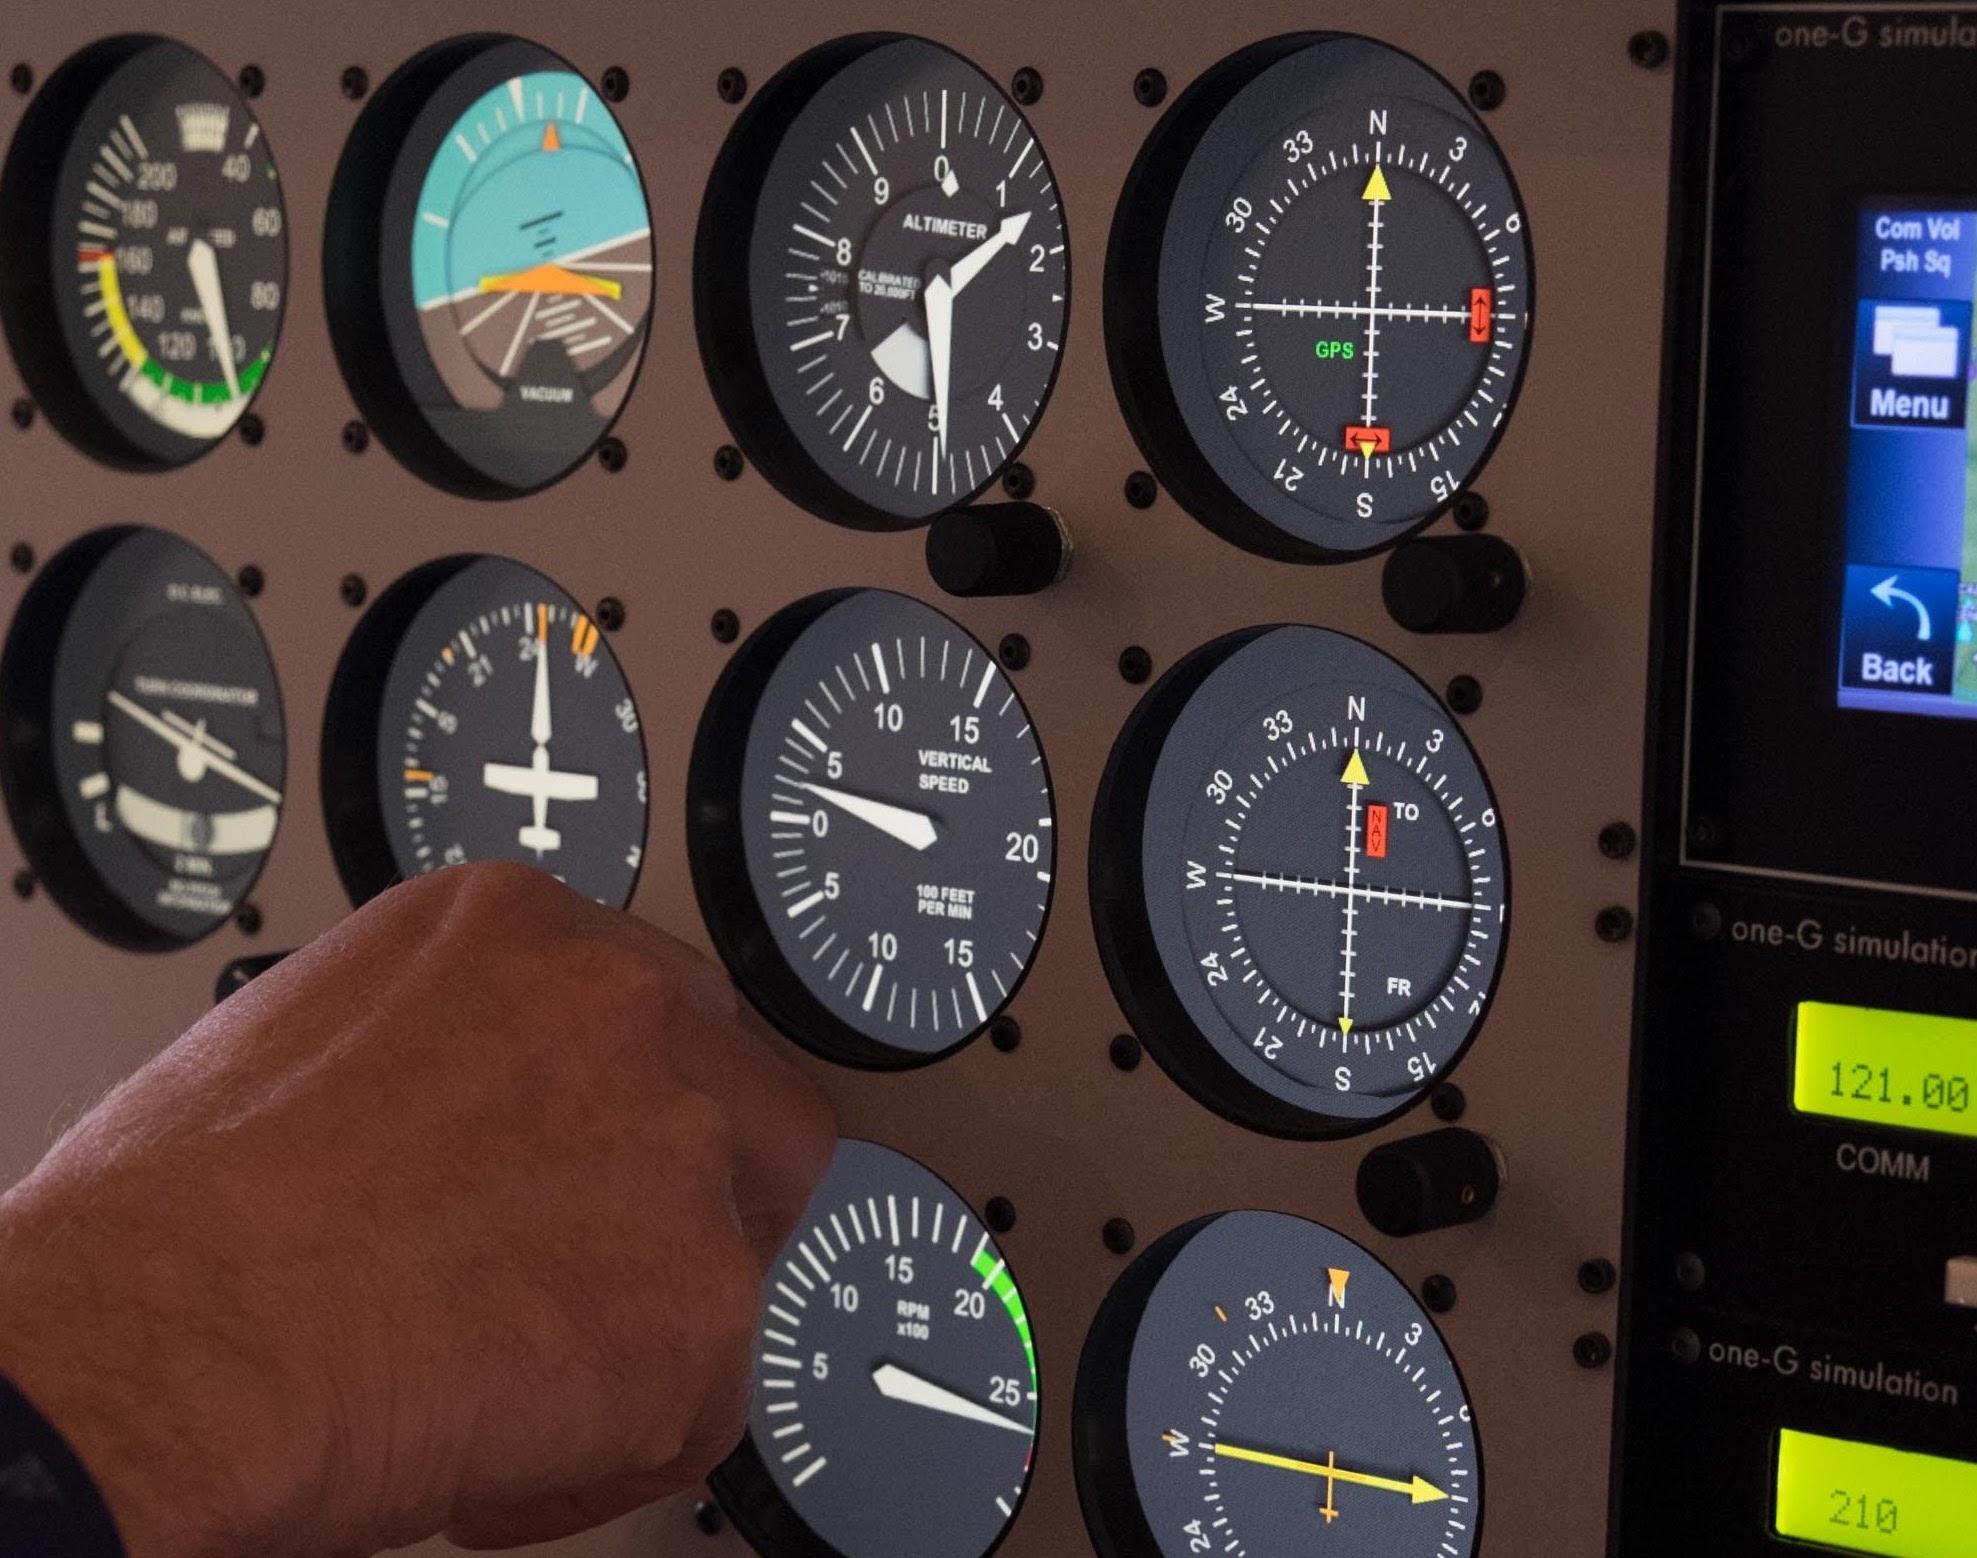 Photo of the Code 1 flight simulator